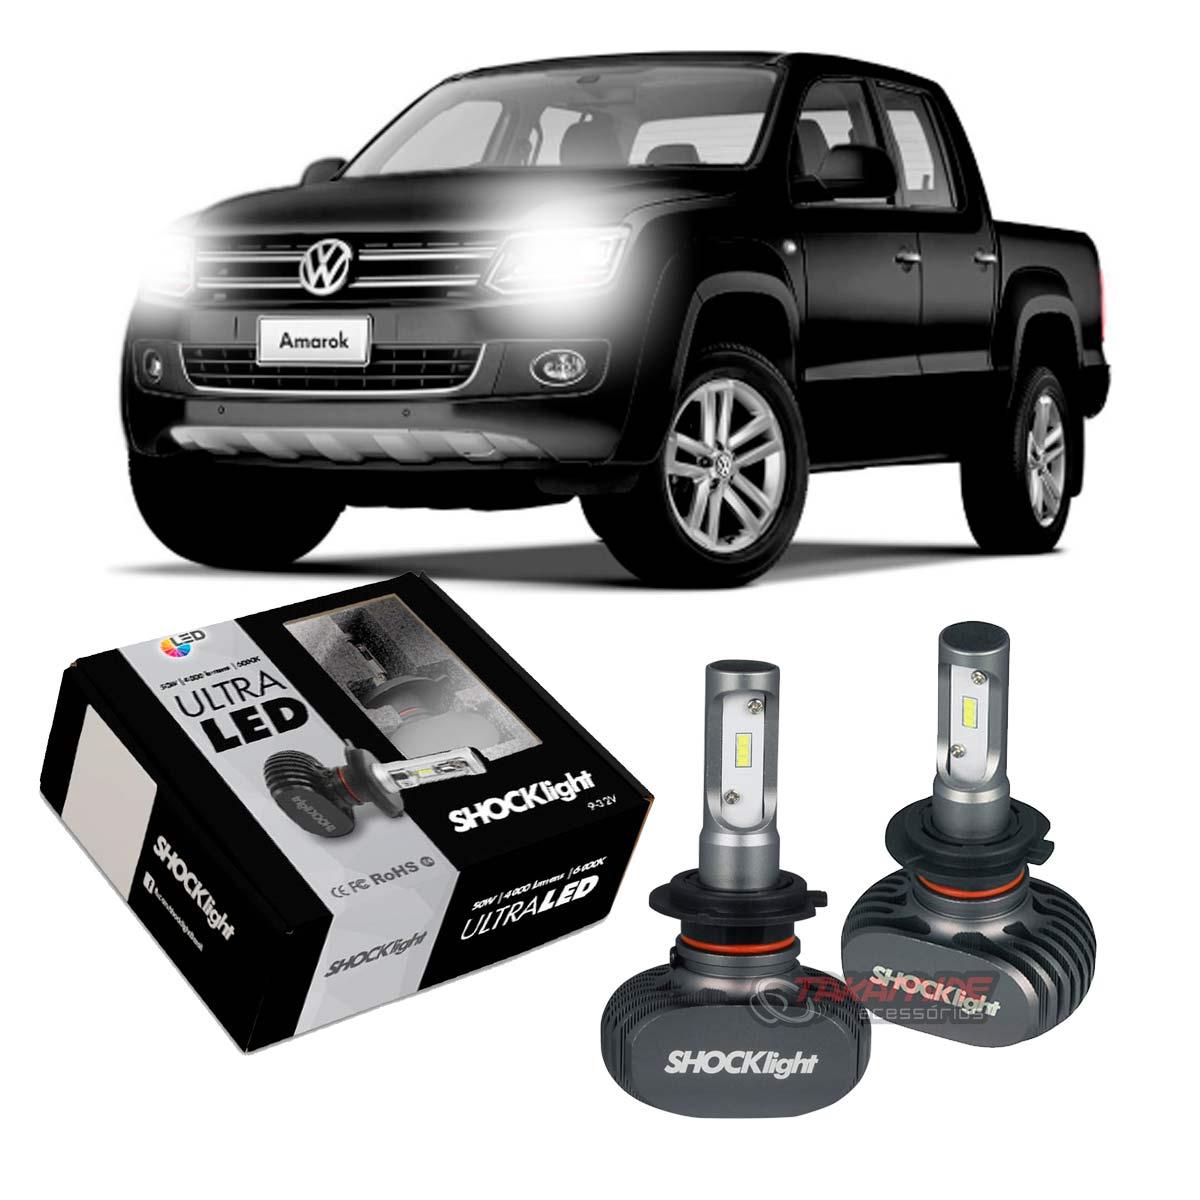 Kit Ultra LED Amarok 2011 2012 2013 2014 2015 tipo xenon farol baixo H7 50W